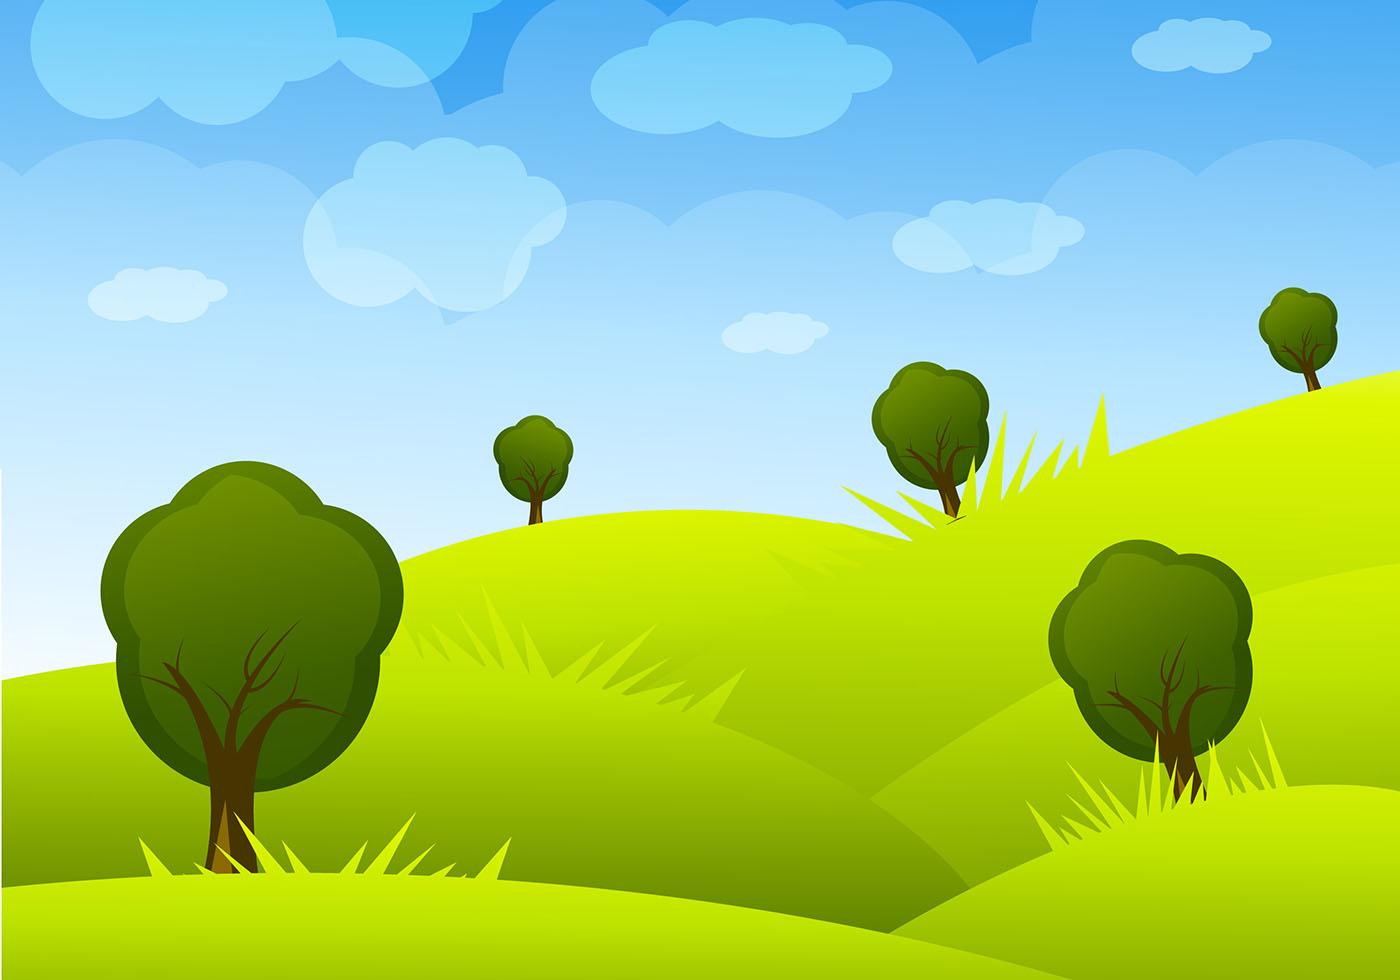 Desert Landscape Wallpaper Hd Cartoon Landscape Vector Download Free Vector Art Stock